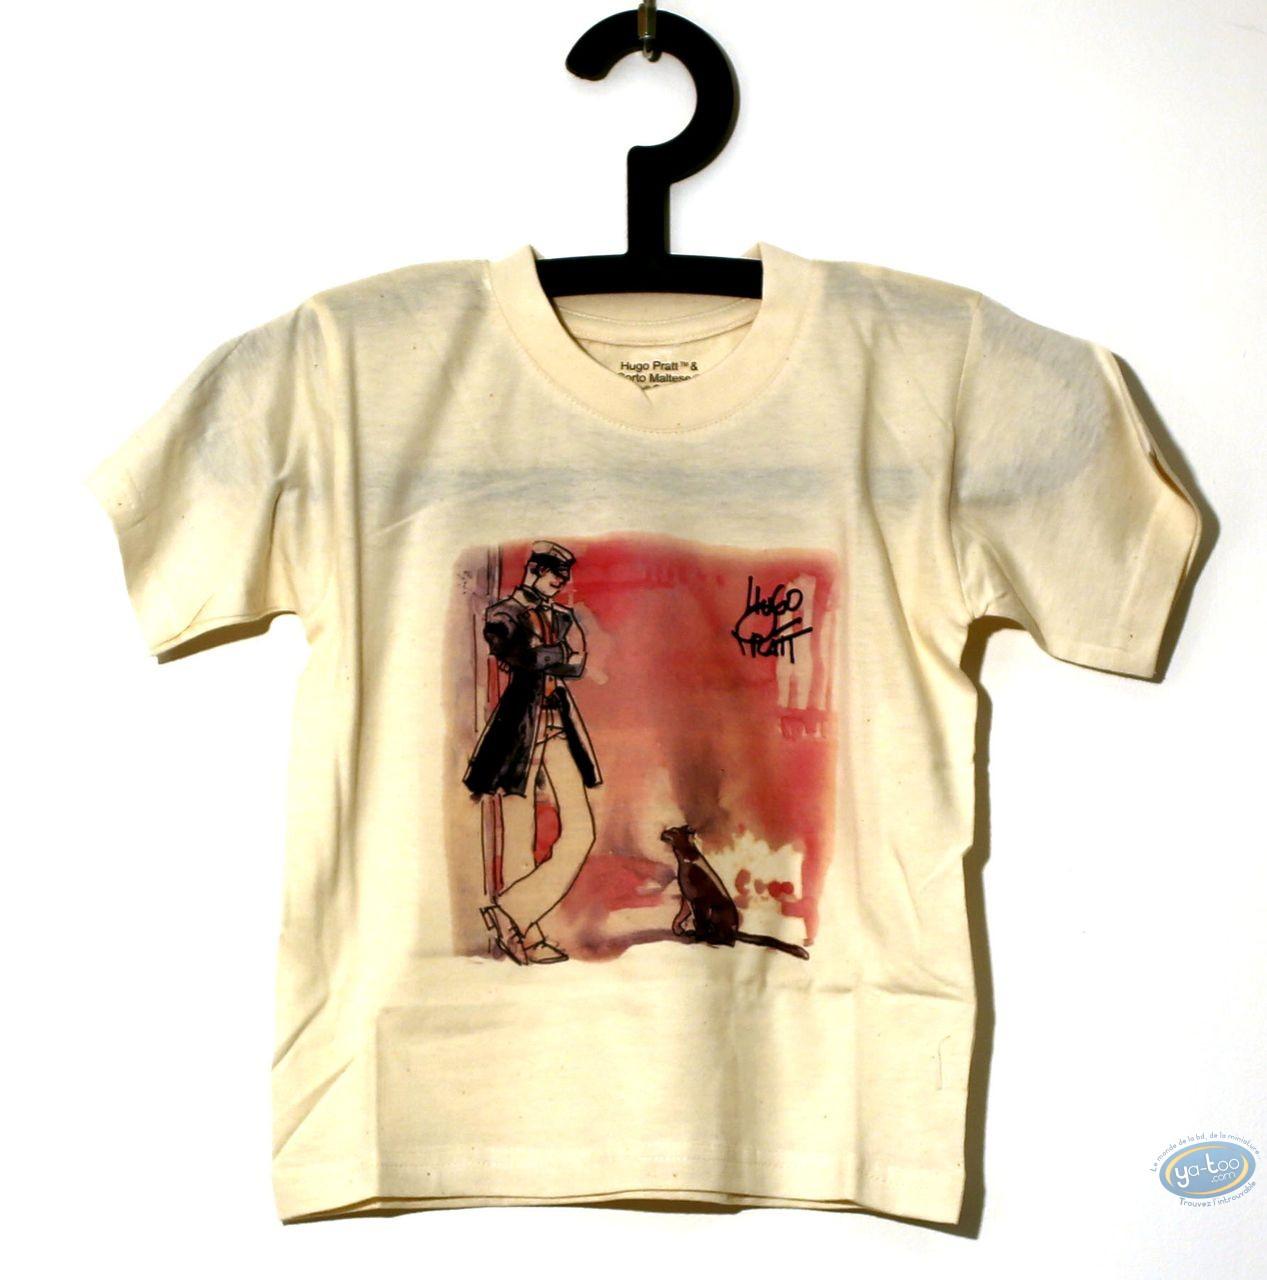 Clothes, Corto Maltese : T-shirt, Corto Maltese : Kid 08/01 - 3/4 years